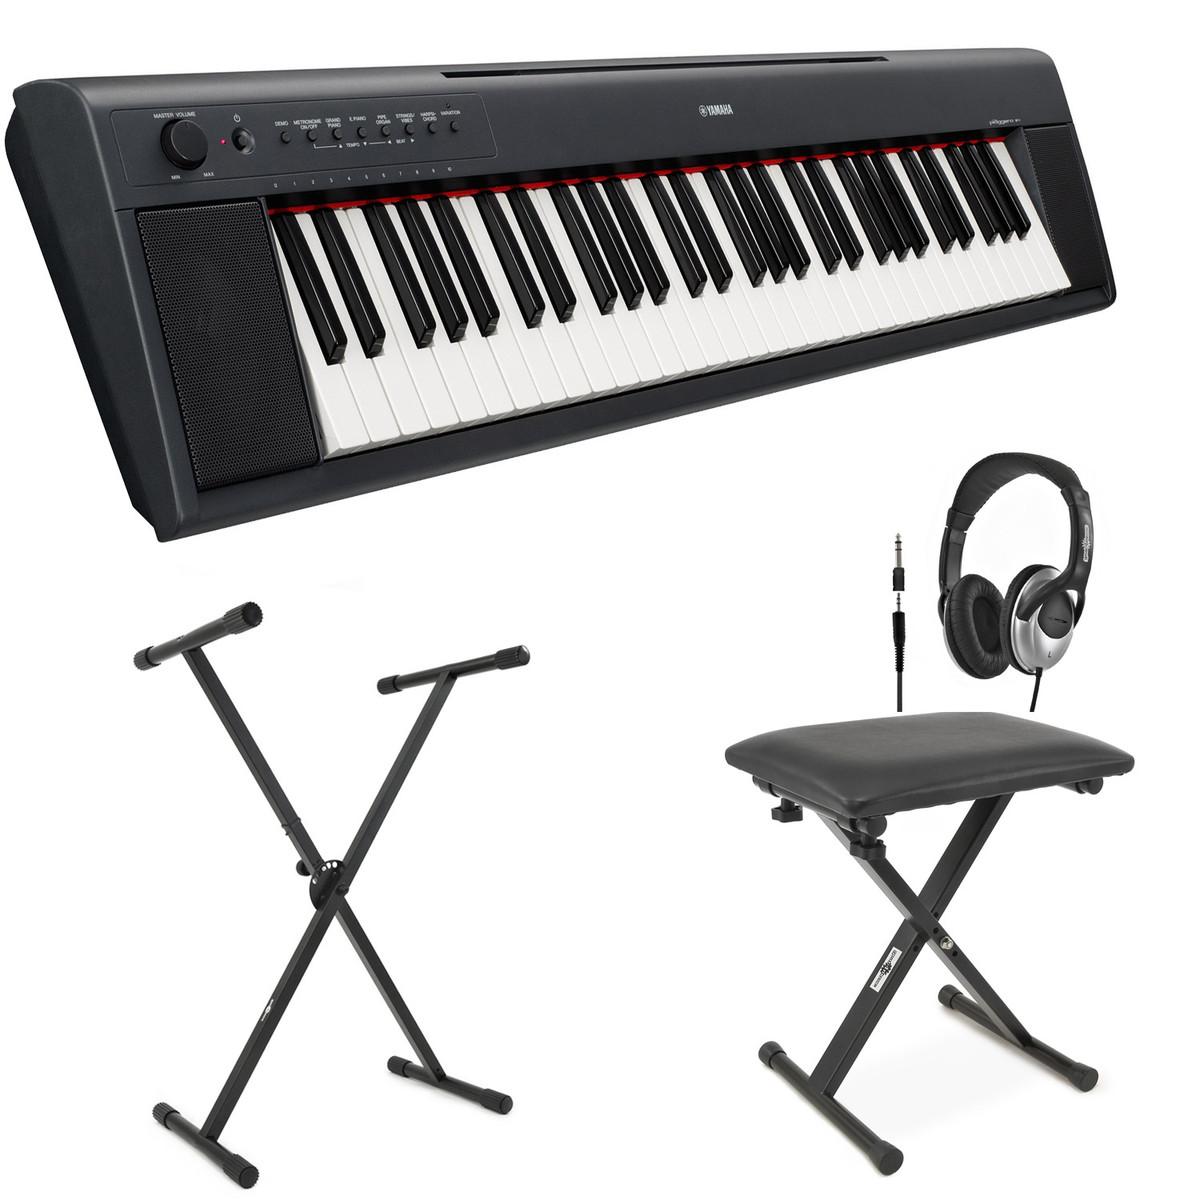 Yamaha np11 piaggero pianoforte digitale portatile nero for Yamaha np11 digital piano